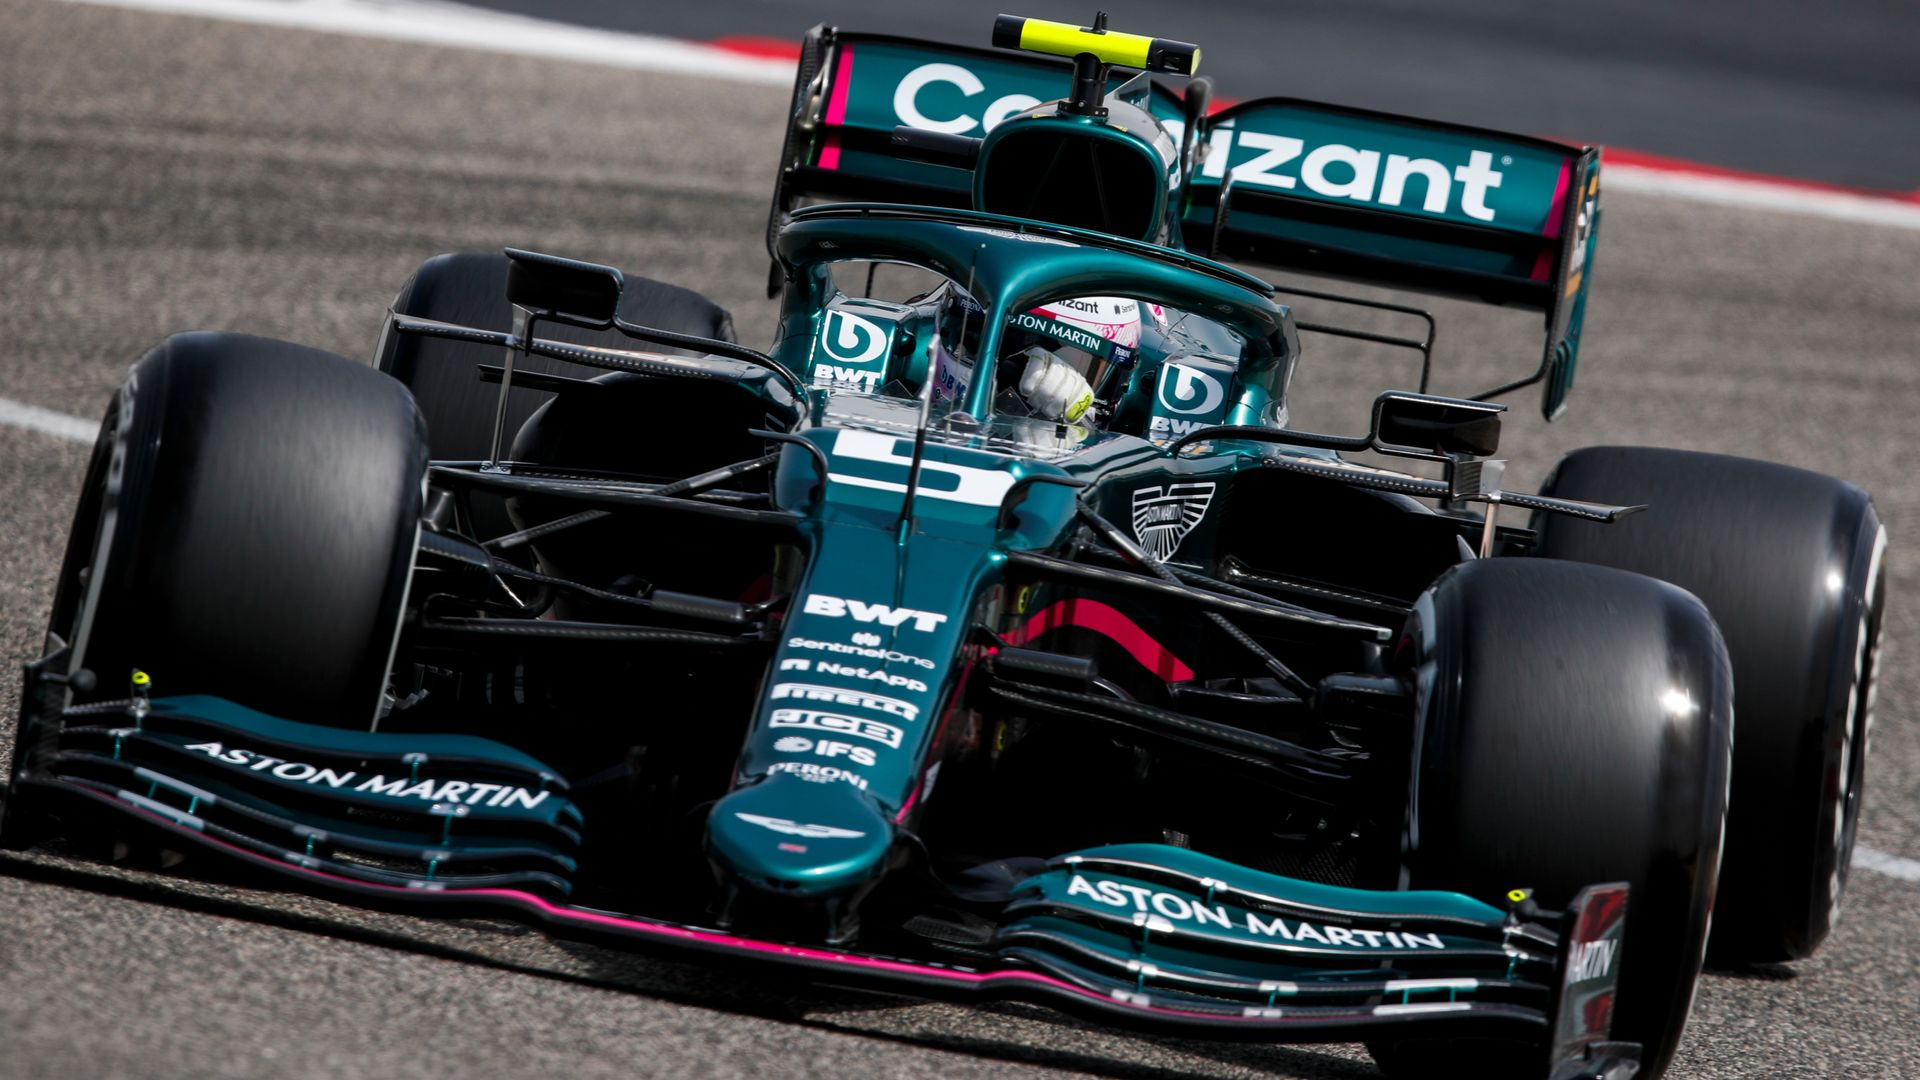 Mercedes, Aston Martin bottom of Testing mileage chart